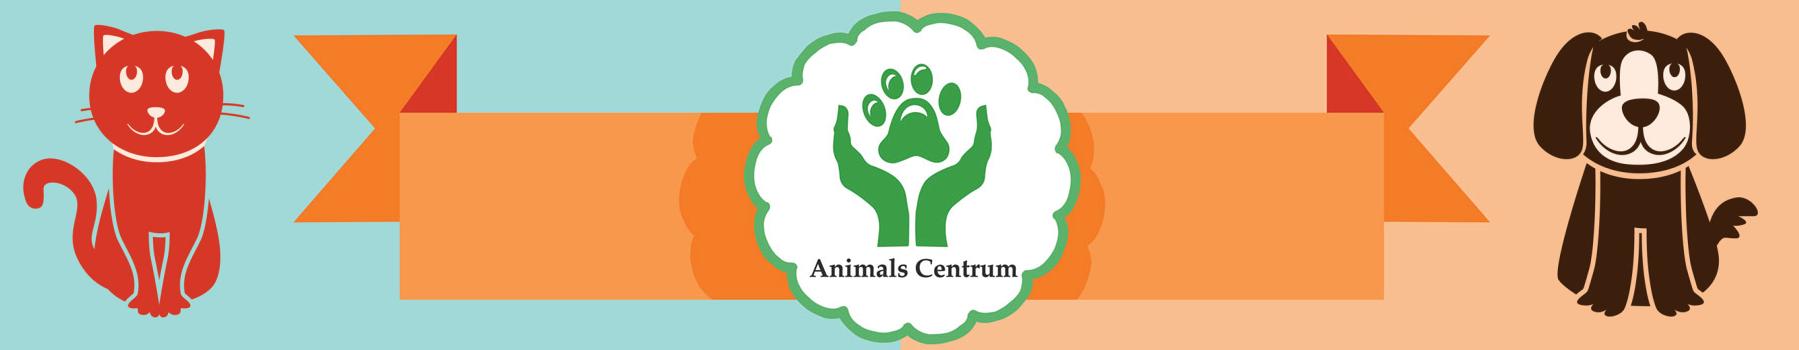 Animals Centrum Olsztyn